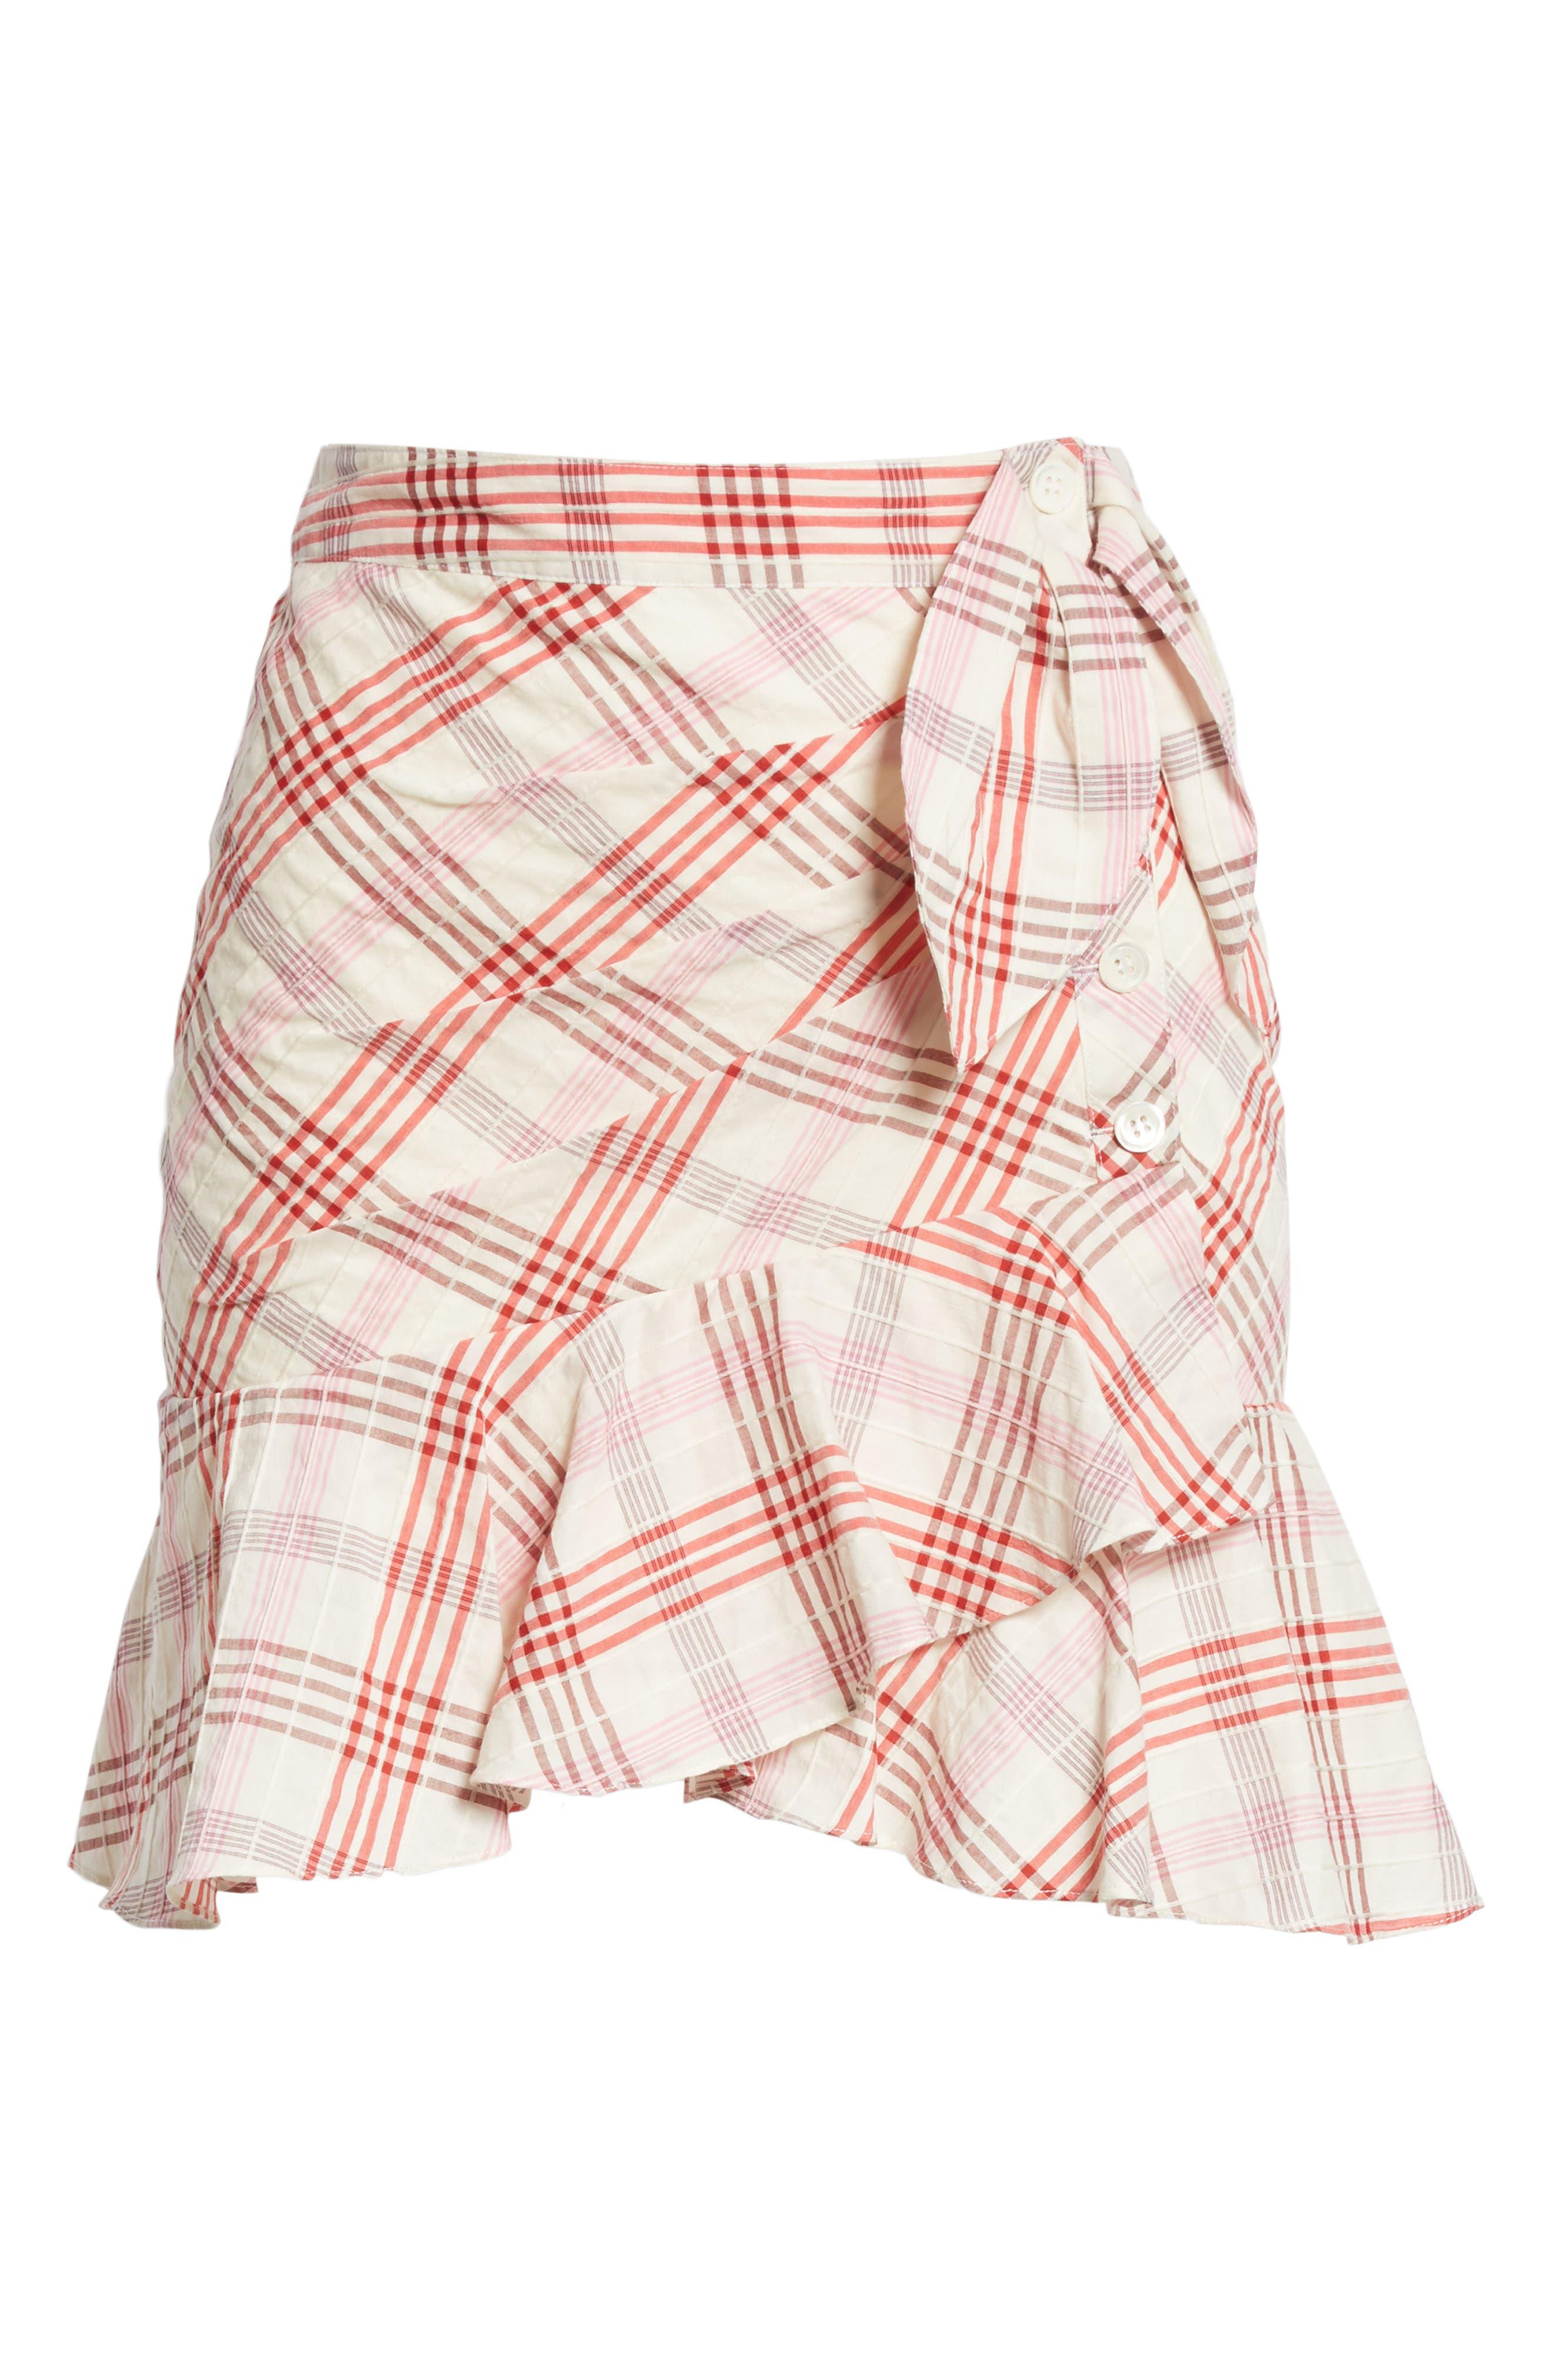 Kaia Check Ruffle Skirt,                             Alternate thumbnail 12, color,